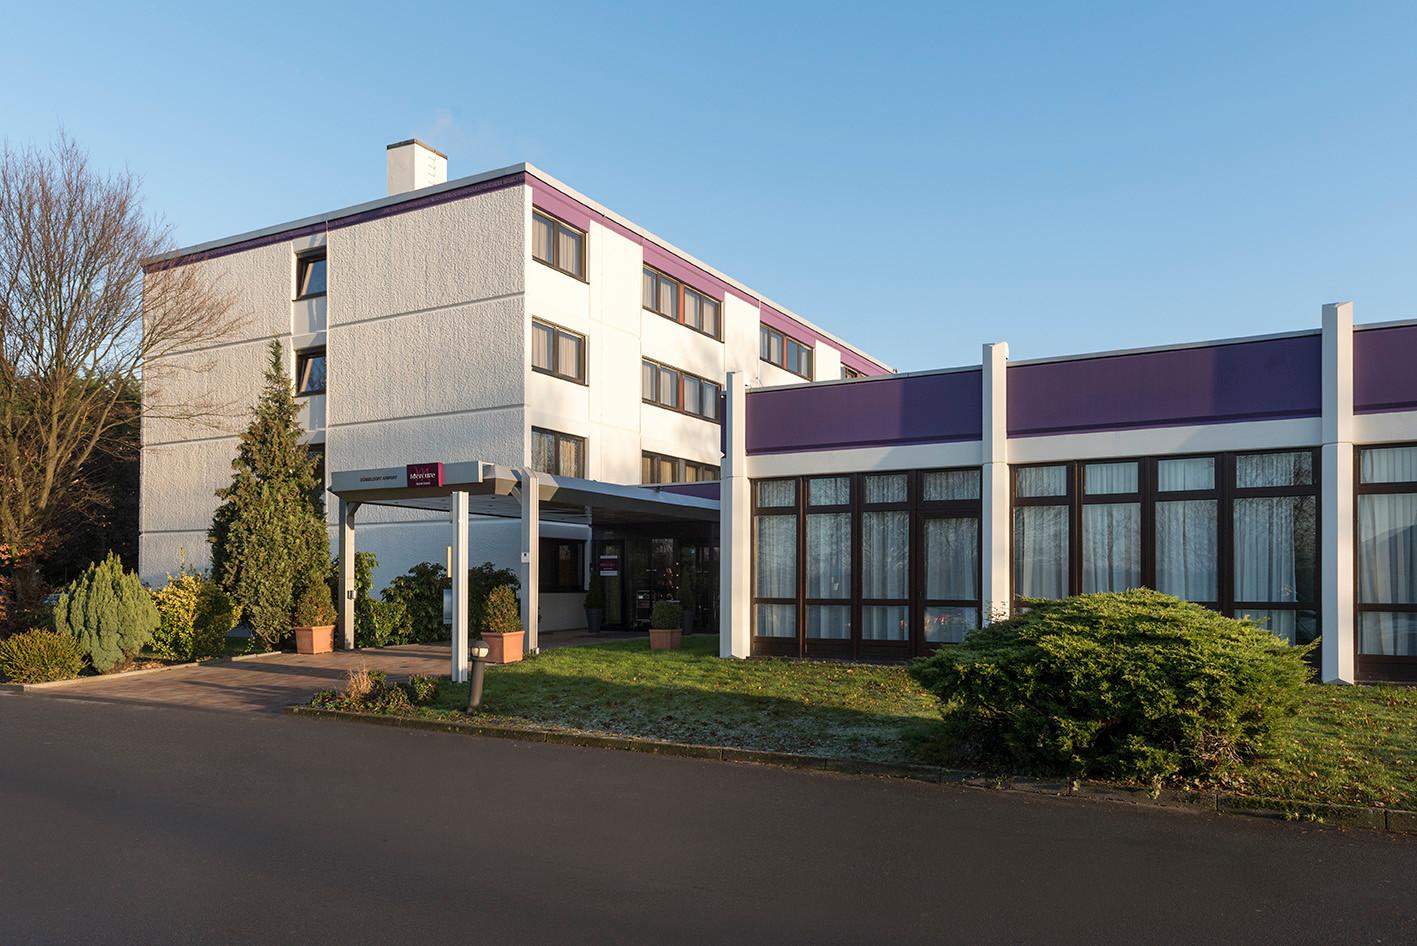 Mercure Hotel Dusseldorf Airport 4 Hotel Dusseldorf